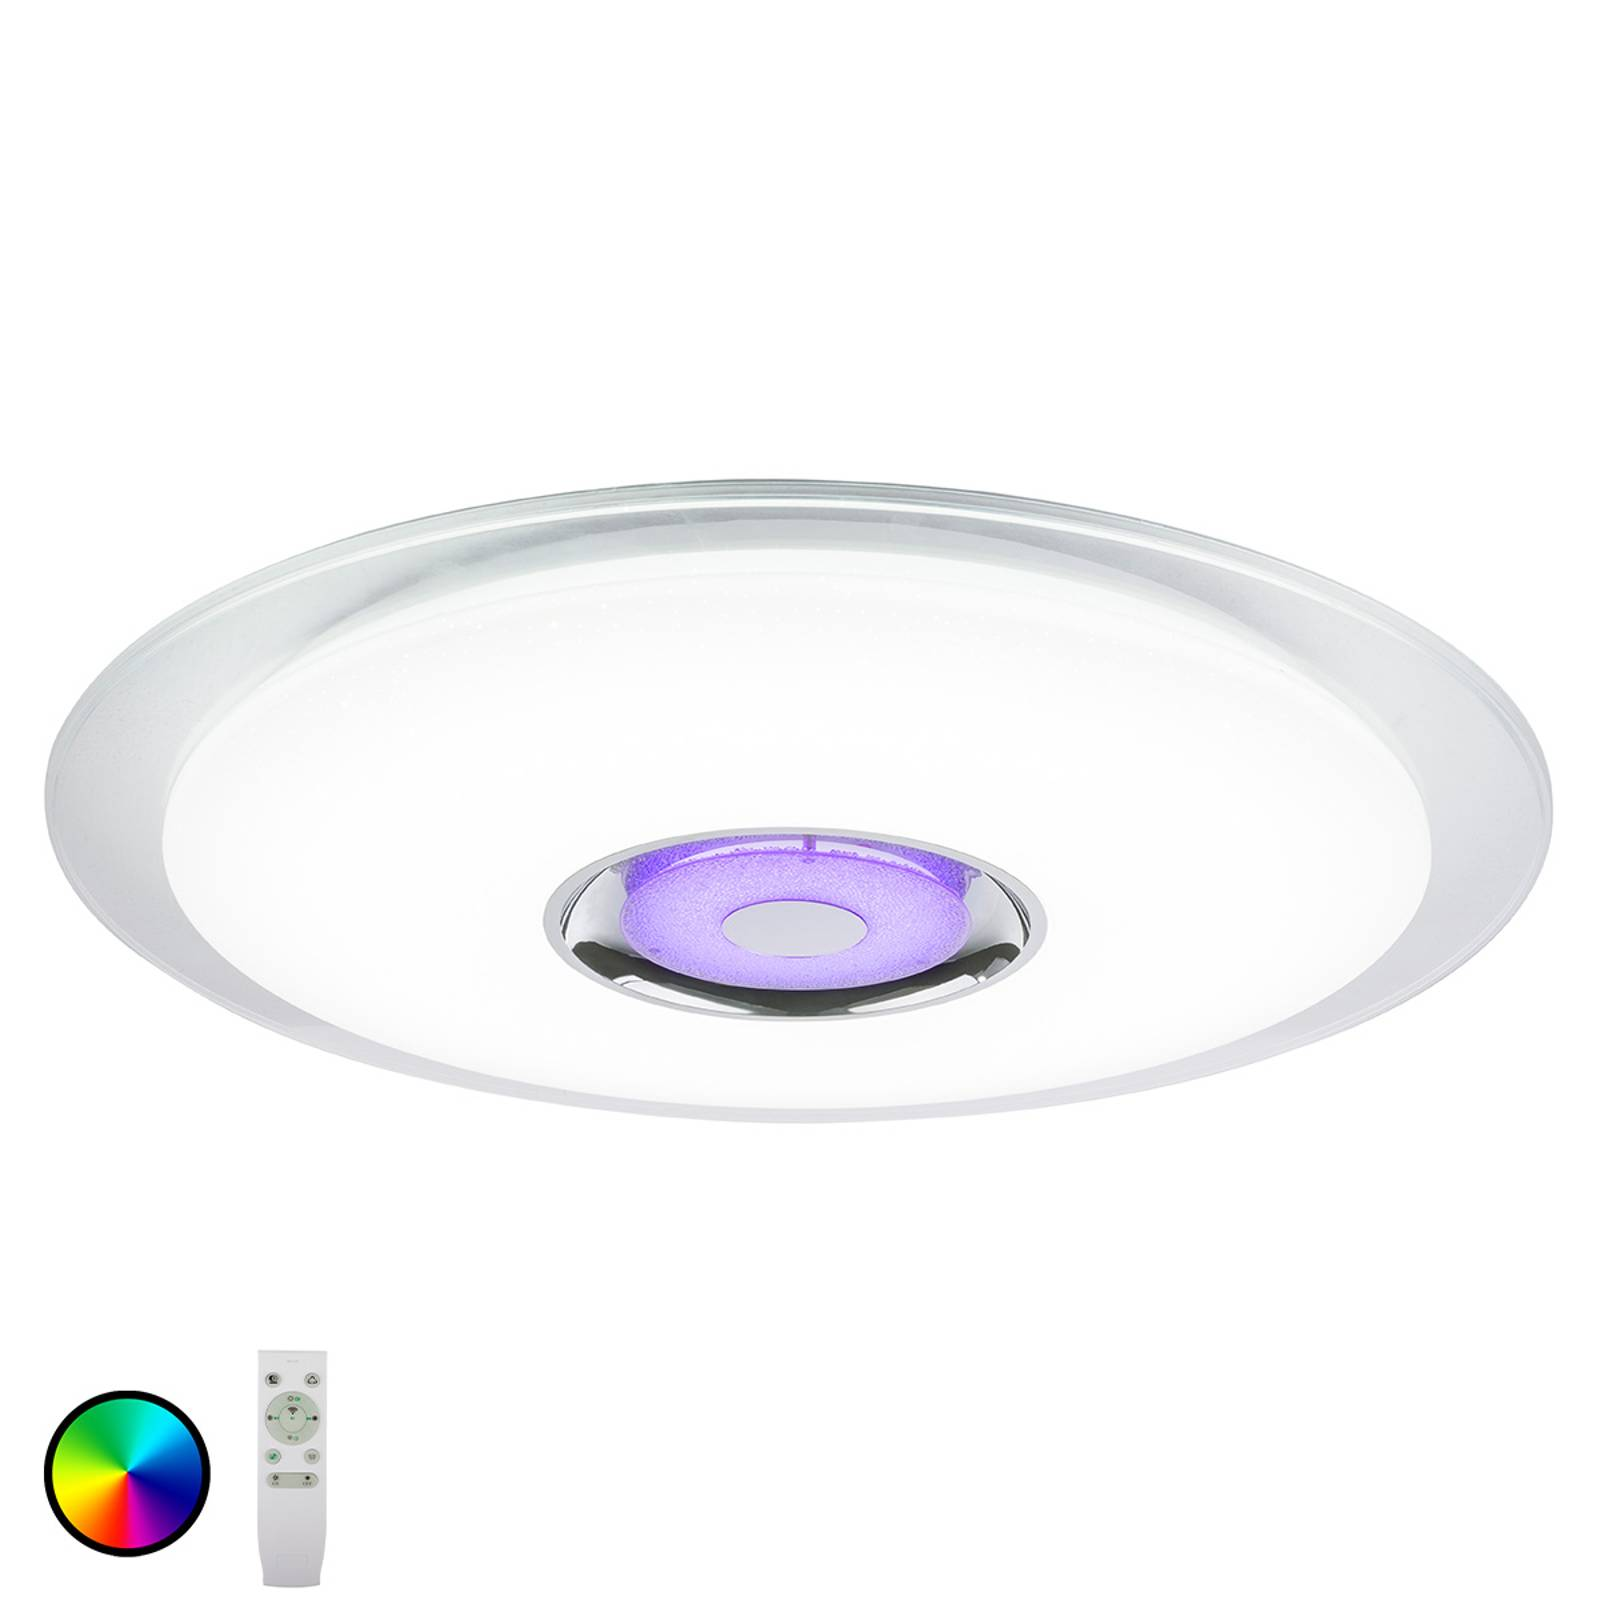 LED-kattovalaisin Tune RGB kaiuttimella Ø 60